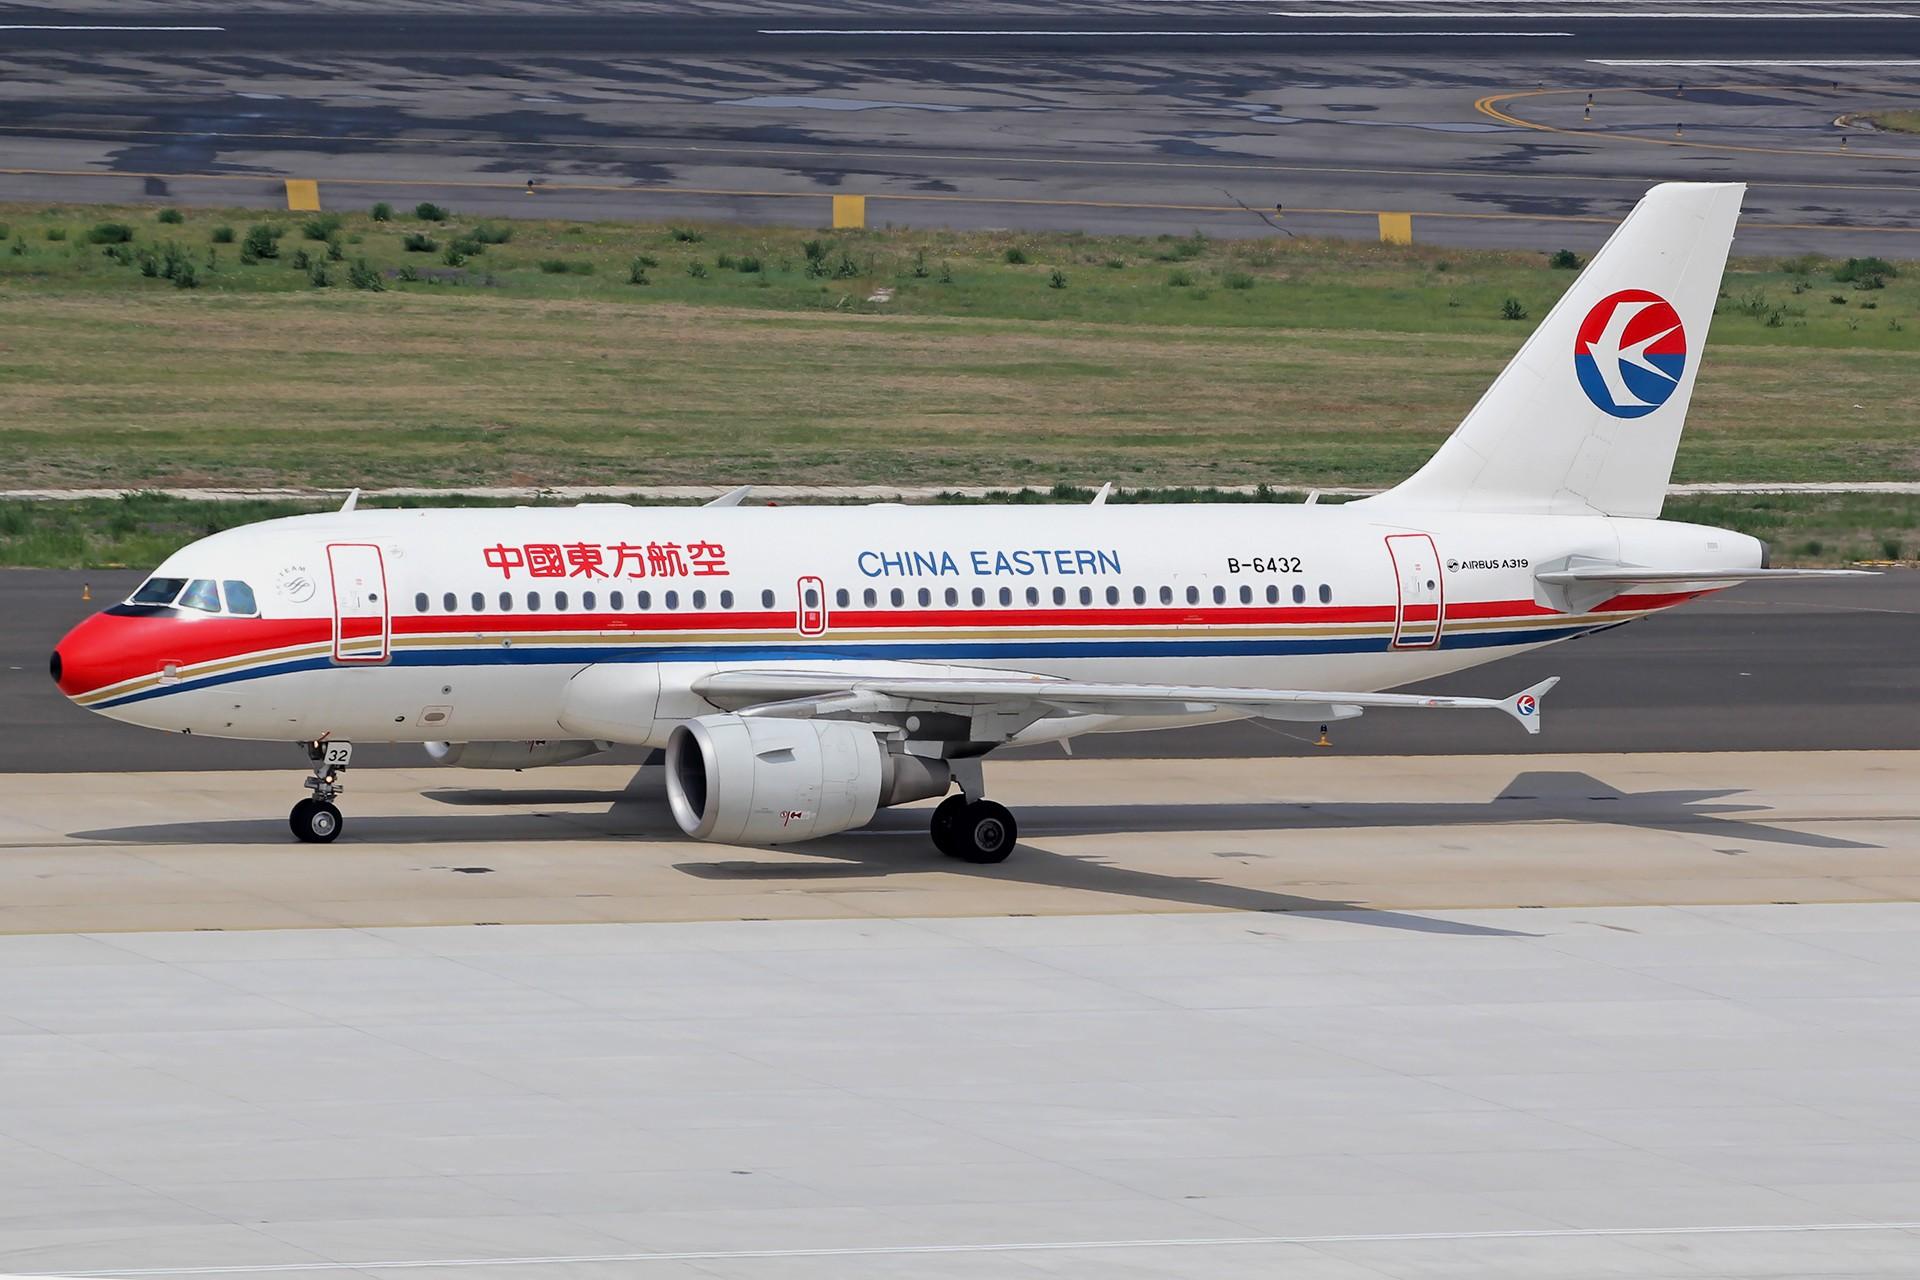 Re:[原创][DLC]雨过天晴,春意盎然…….. AIRBUS A319-100 B-6432 中国大连周水子国际机场